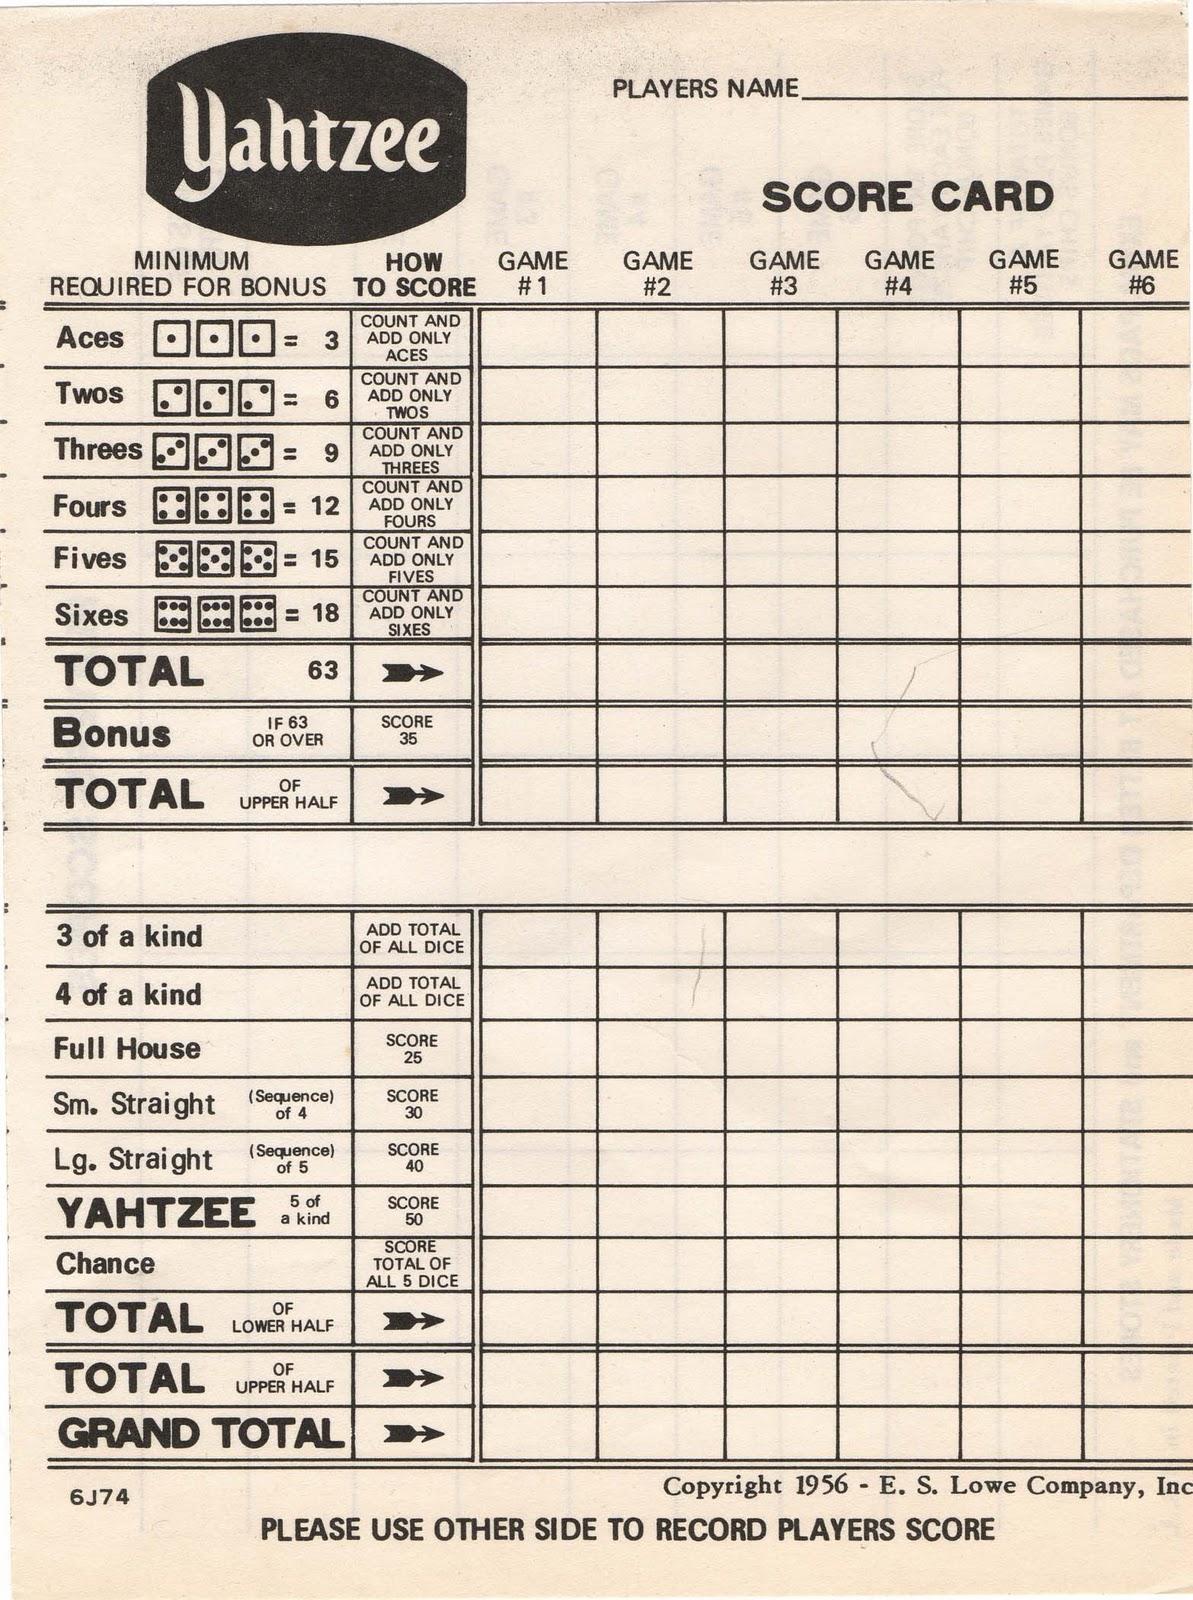 Yahtzee Score Card Printable Printable Sheet Yahtzee Score